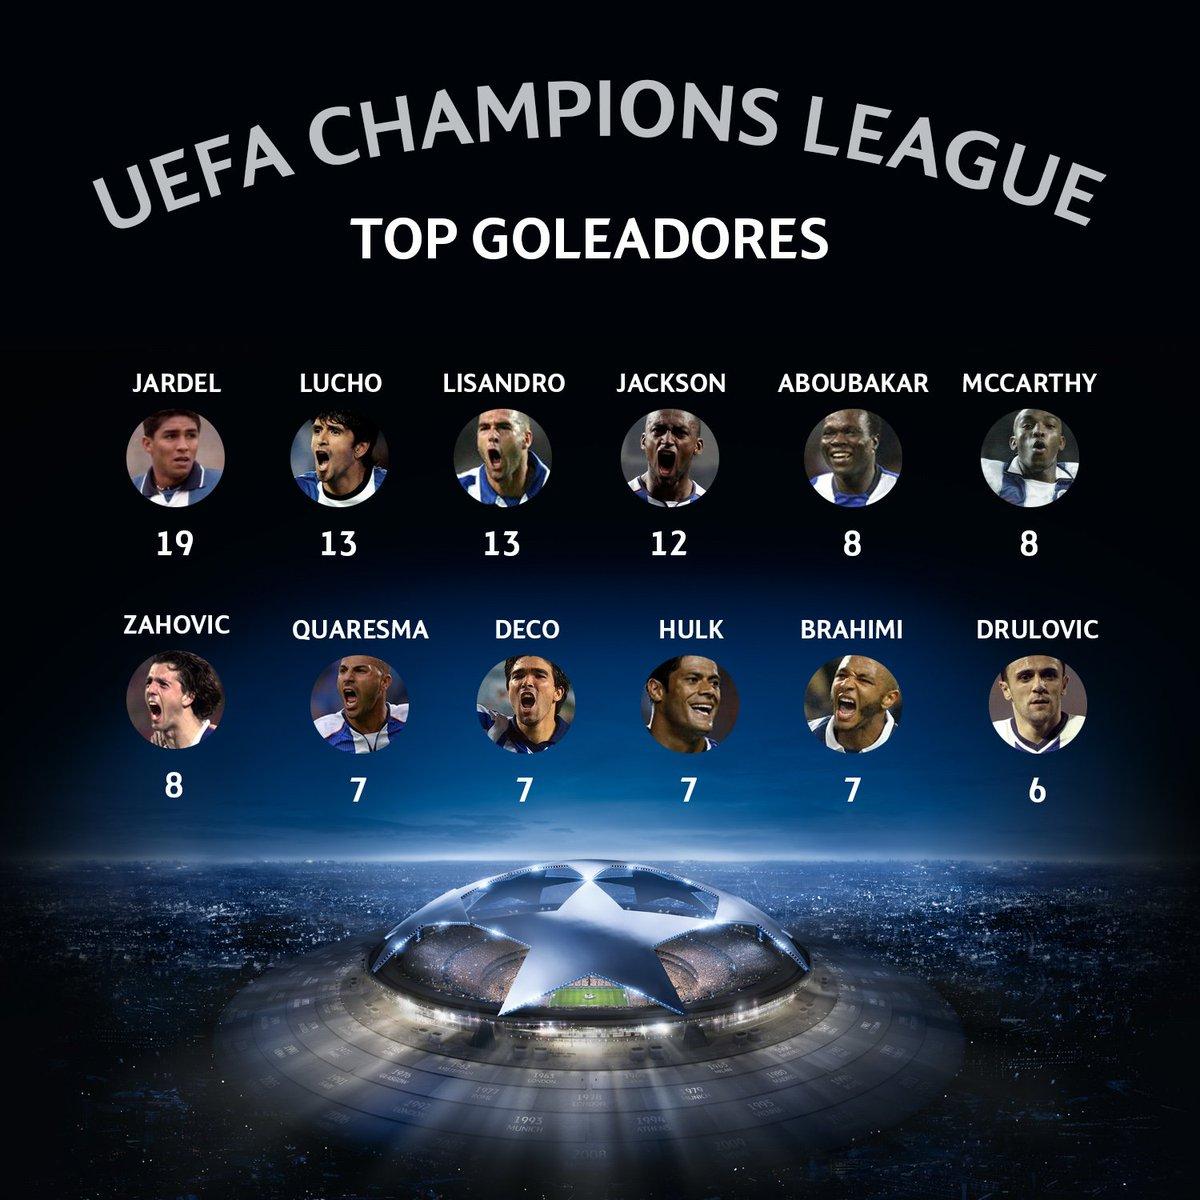 Após bisar frente ao AS Mónaco, Aboubakar já está no Top 5 🔵⚪️⚽️   #FCPorto #RBLFCP #UCL